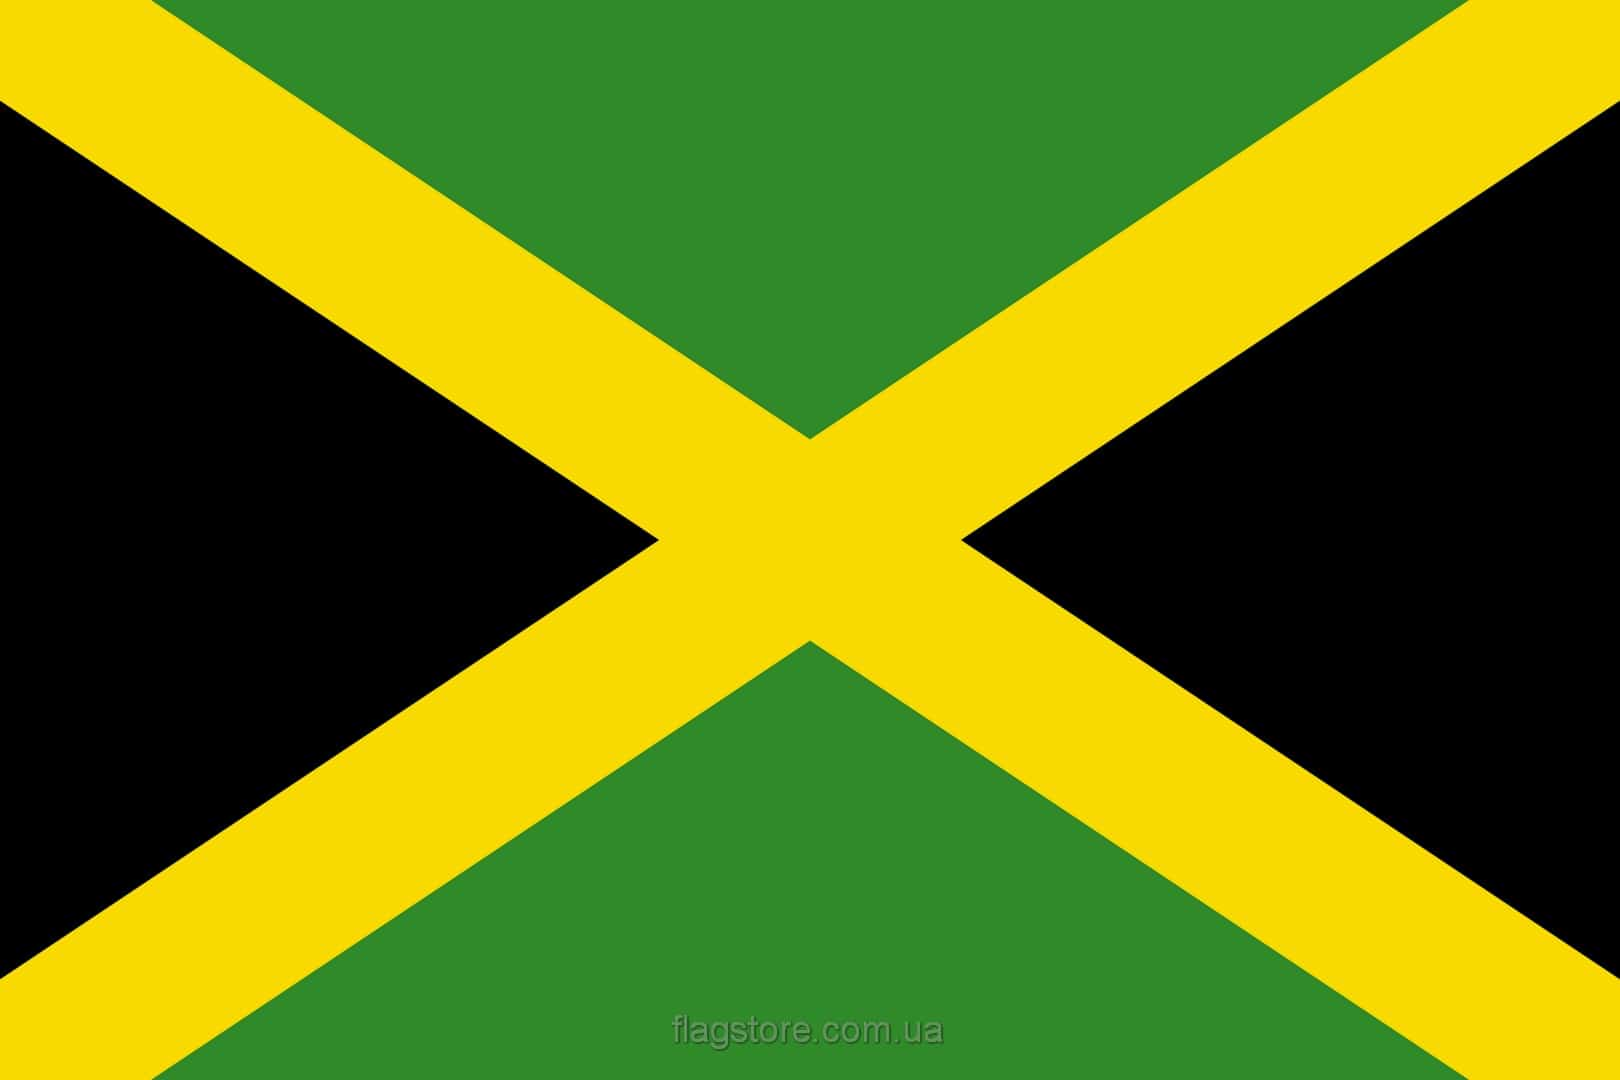 Купить флаг Ямайки (страны Ямайка)